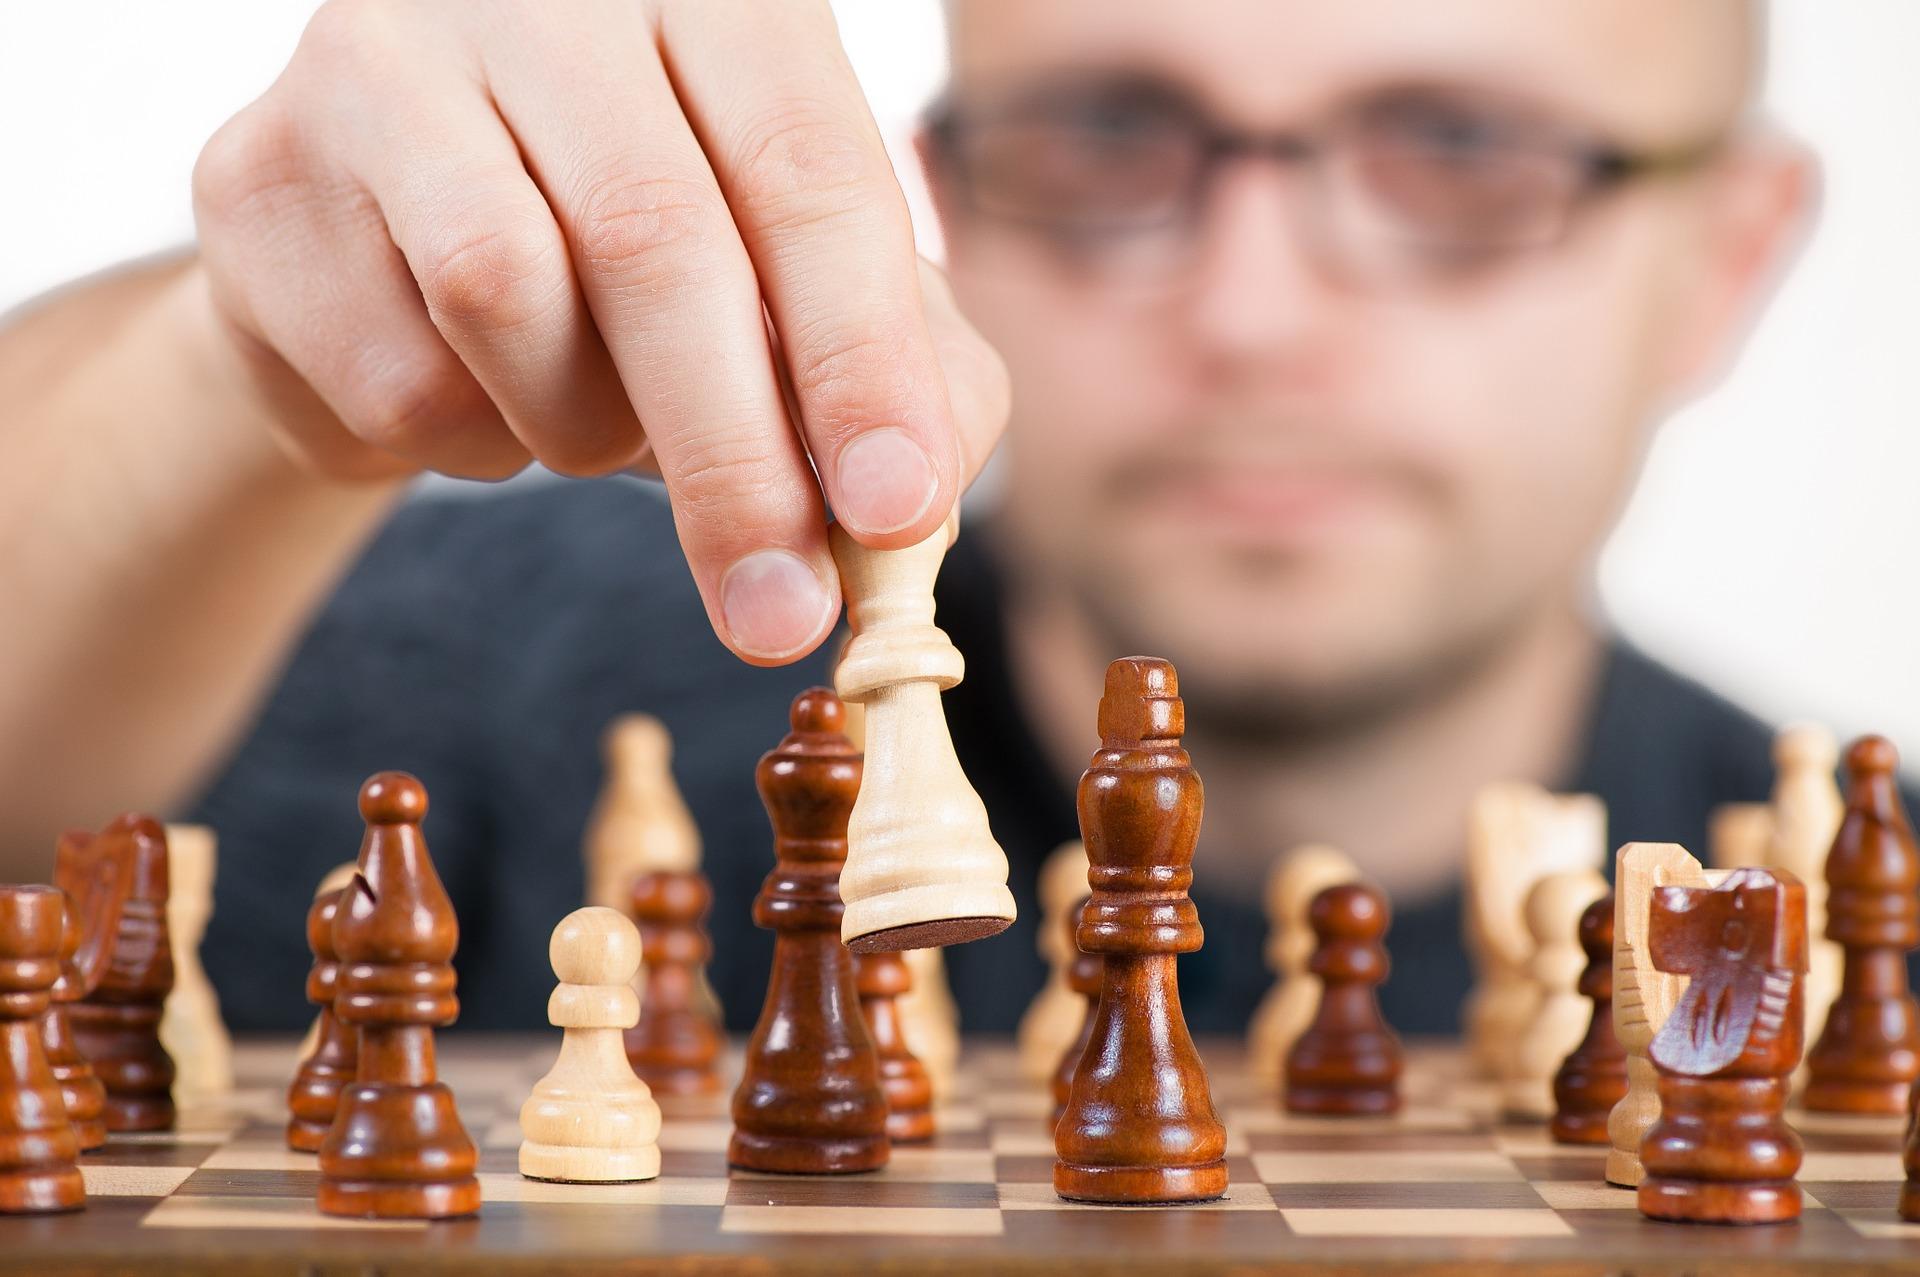 the-strategy-1080527_1920.jpg